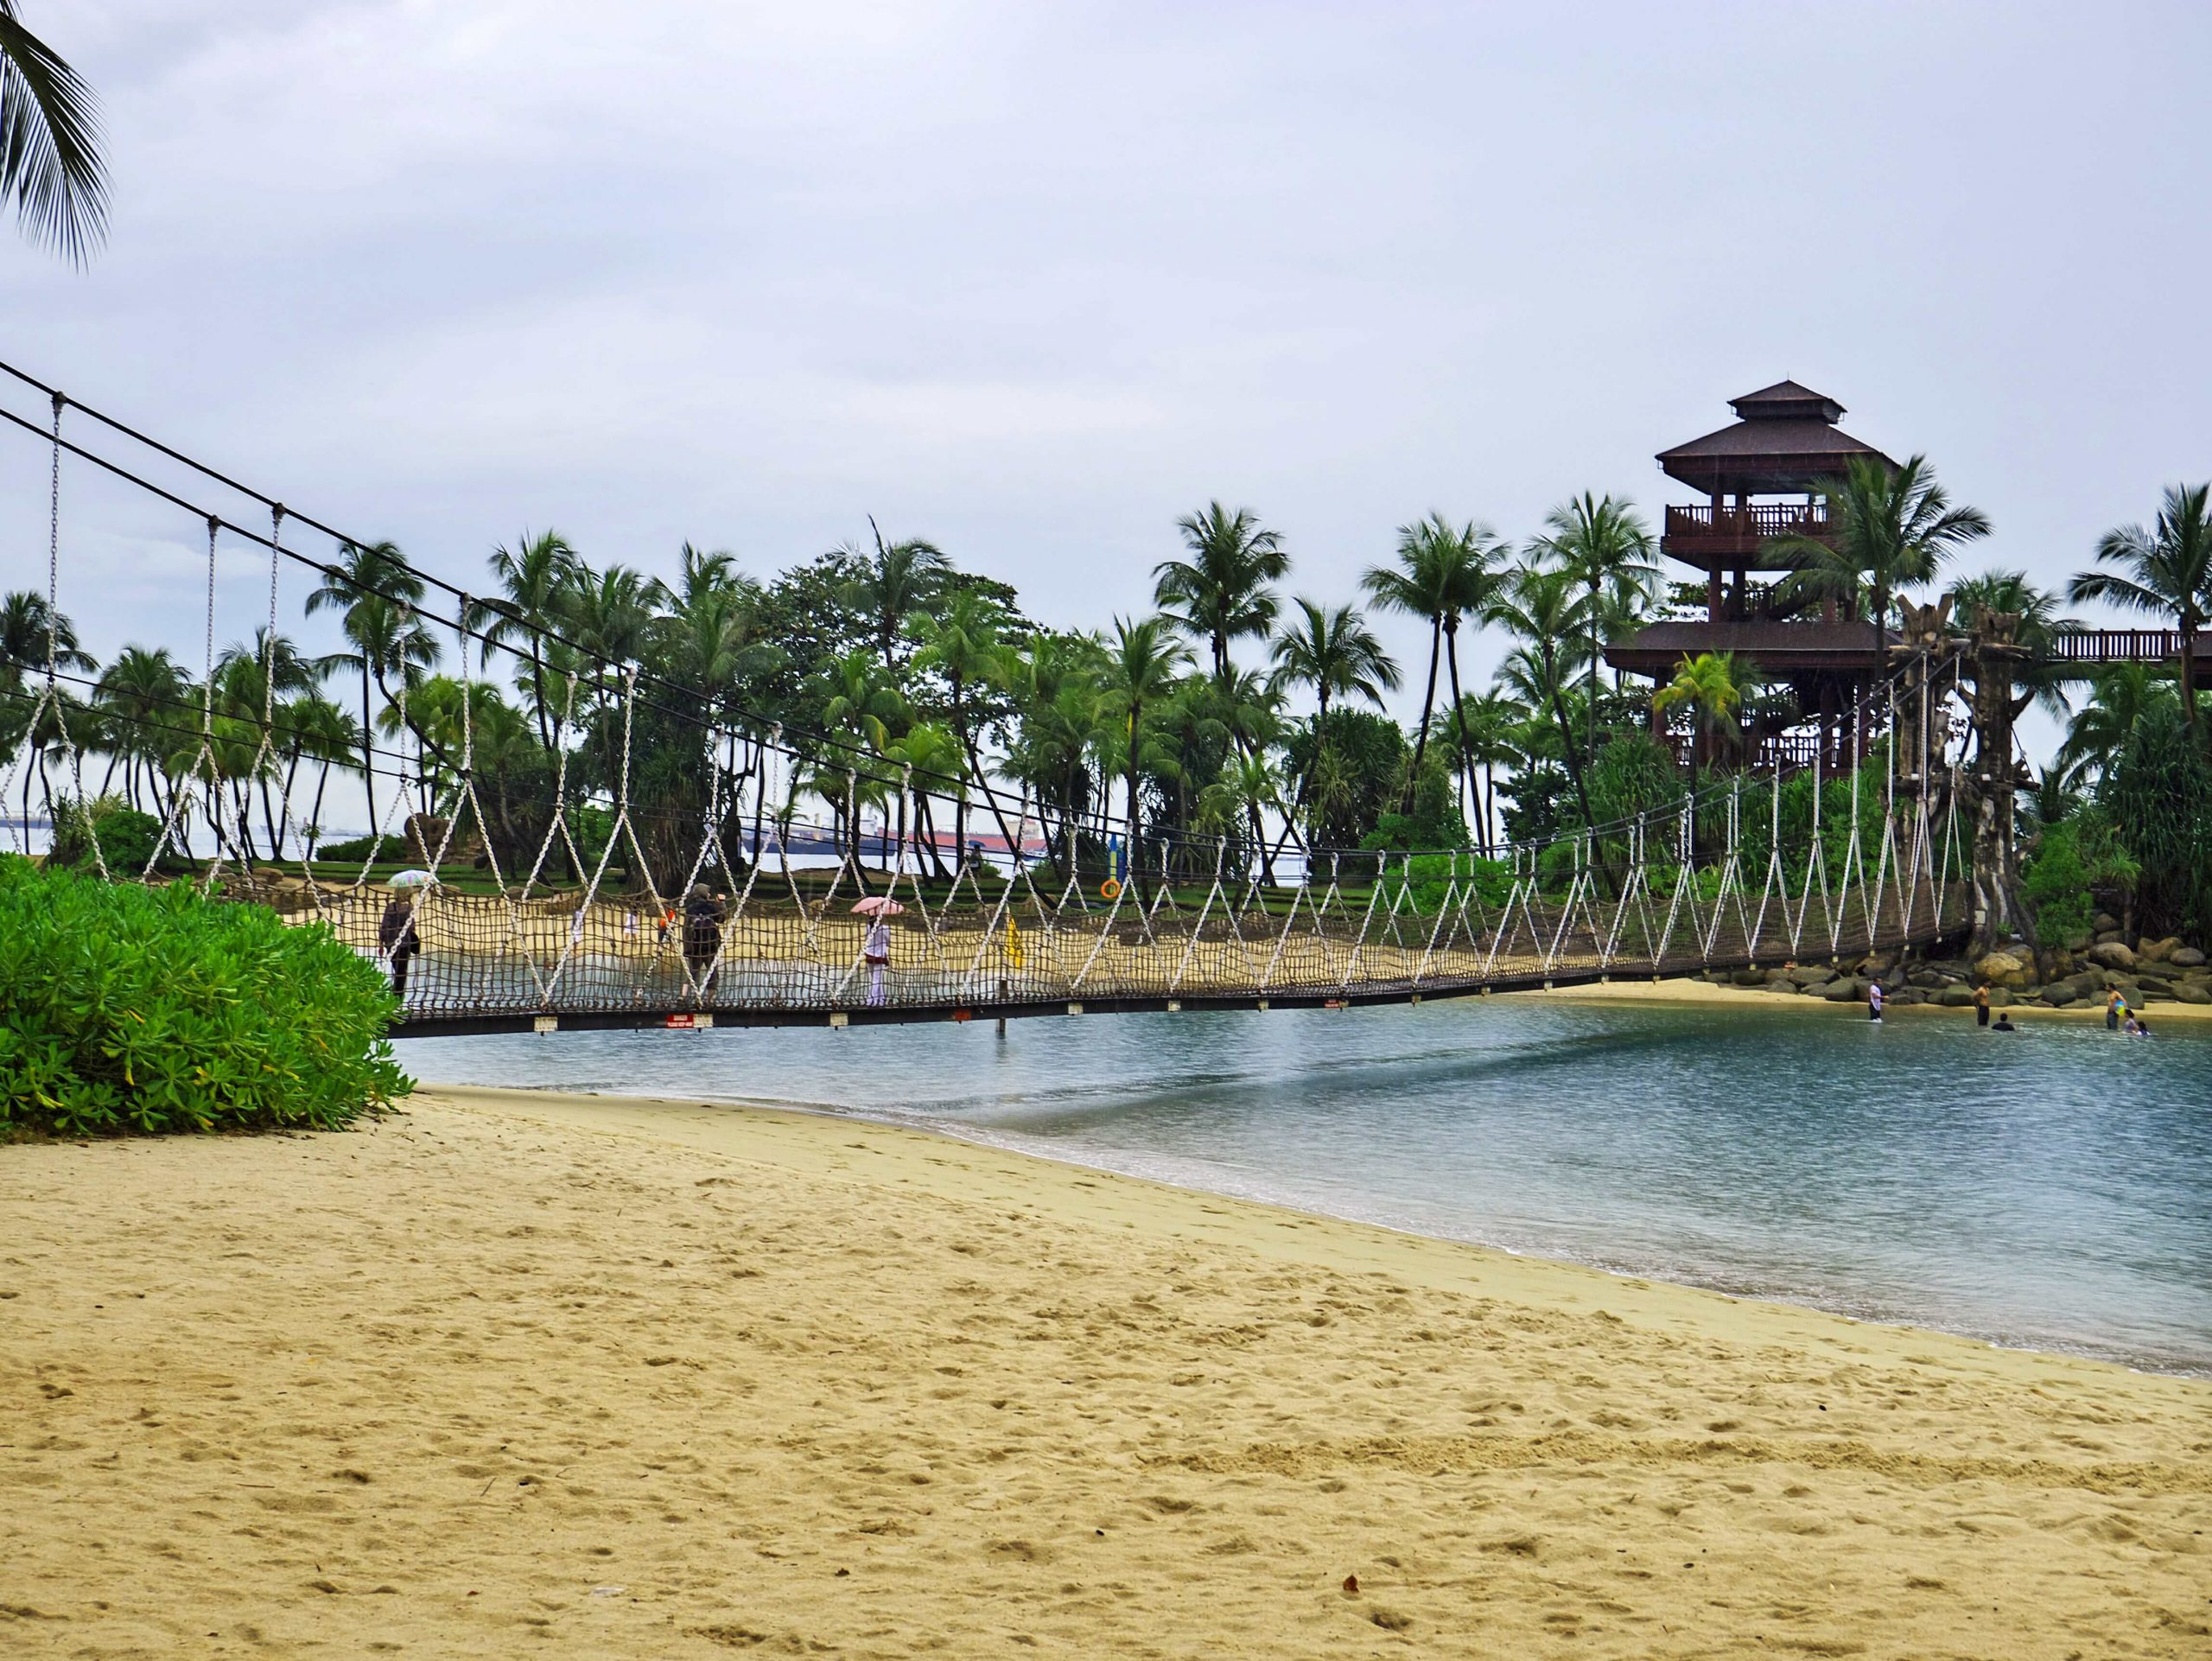 tempat-wisata-singapore-sentosa-island